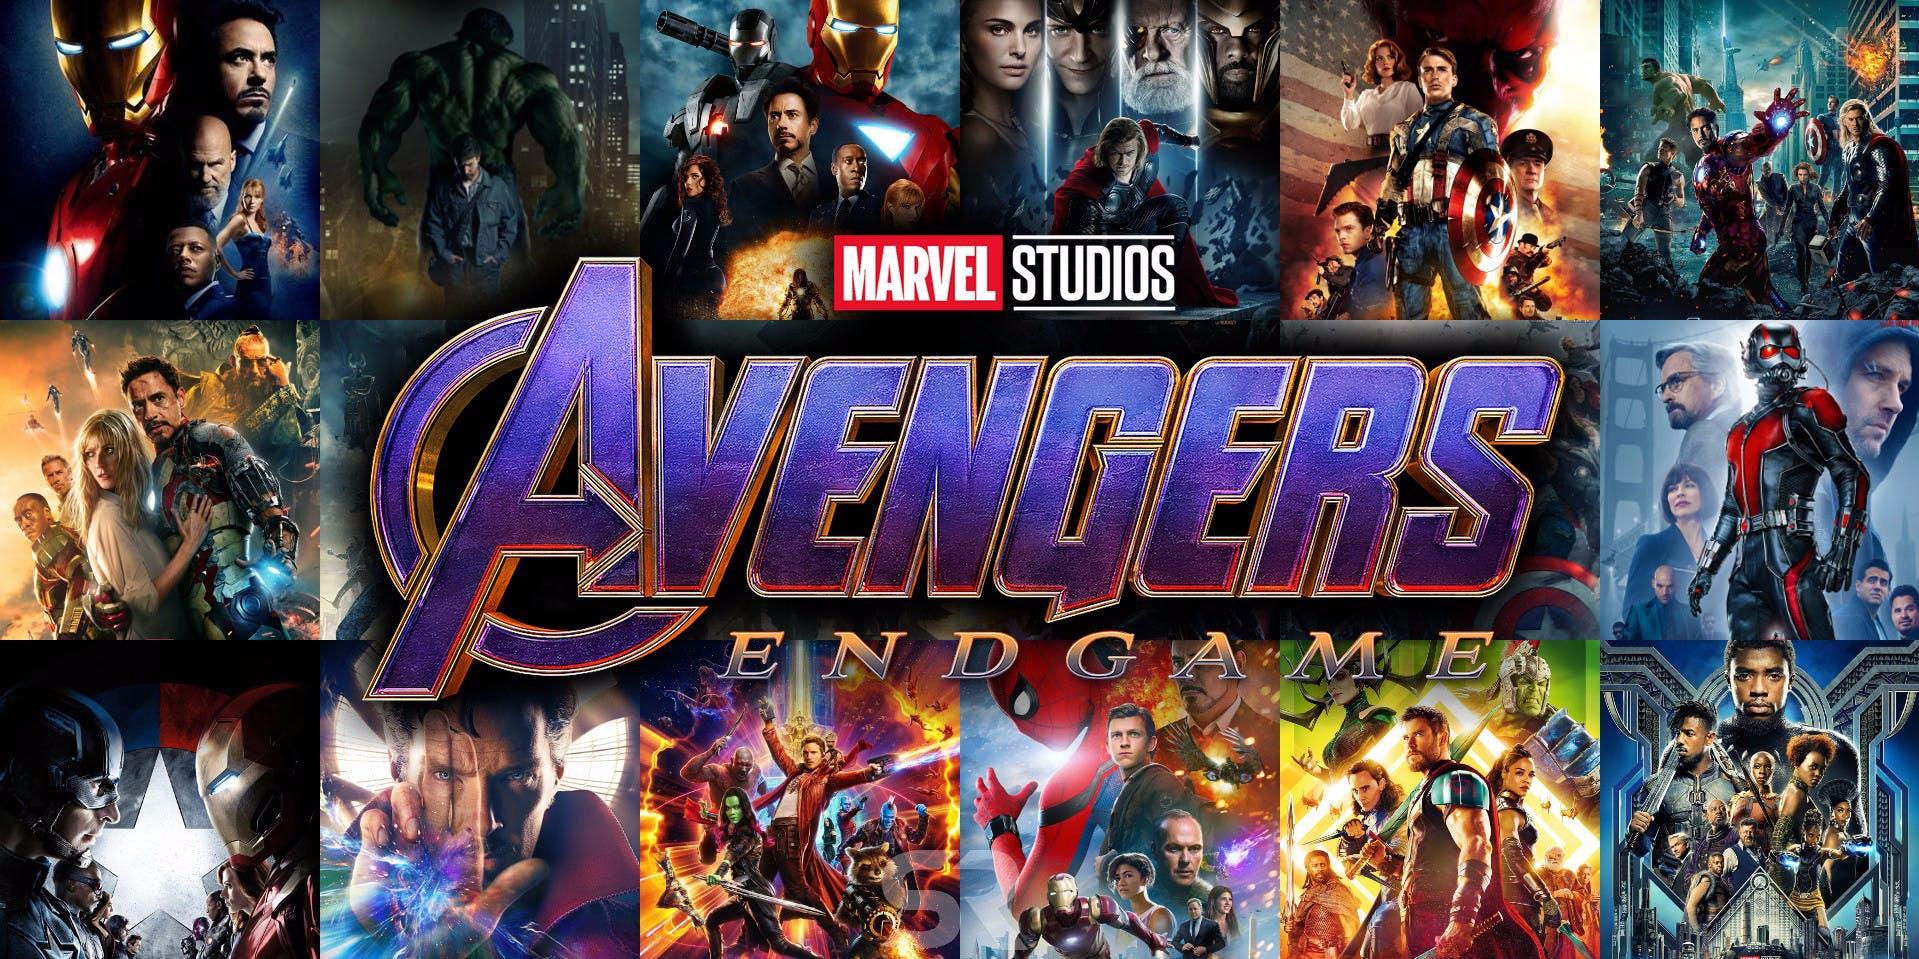 Avengers-Endgame-MCU-Rewatch.jpg